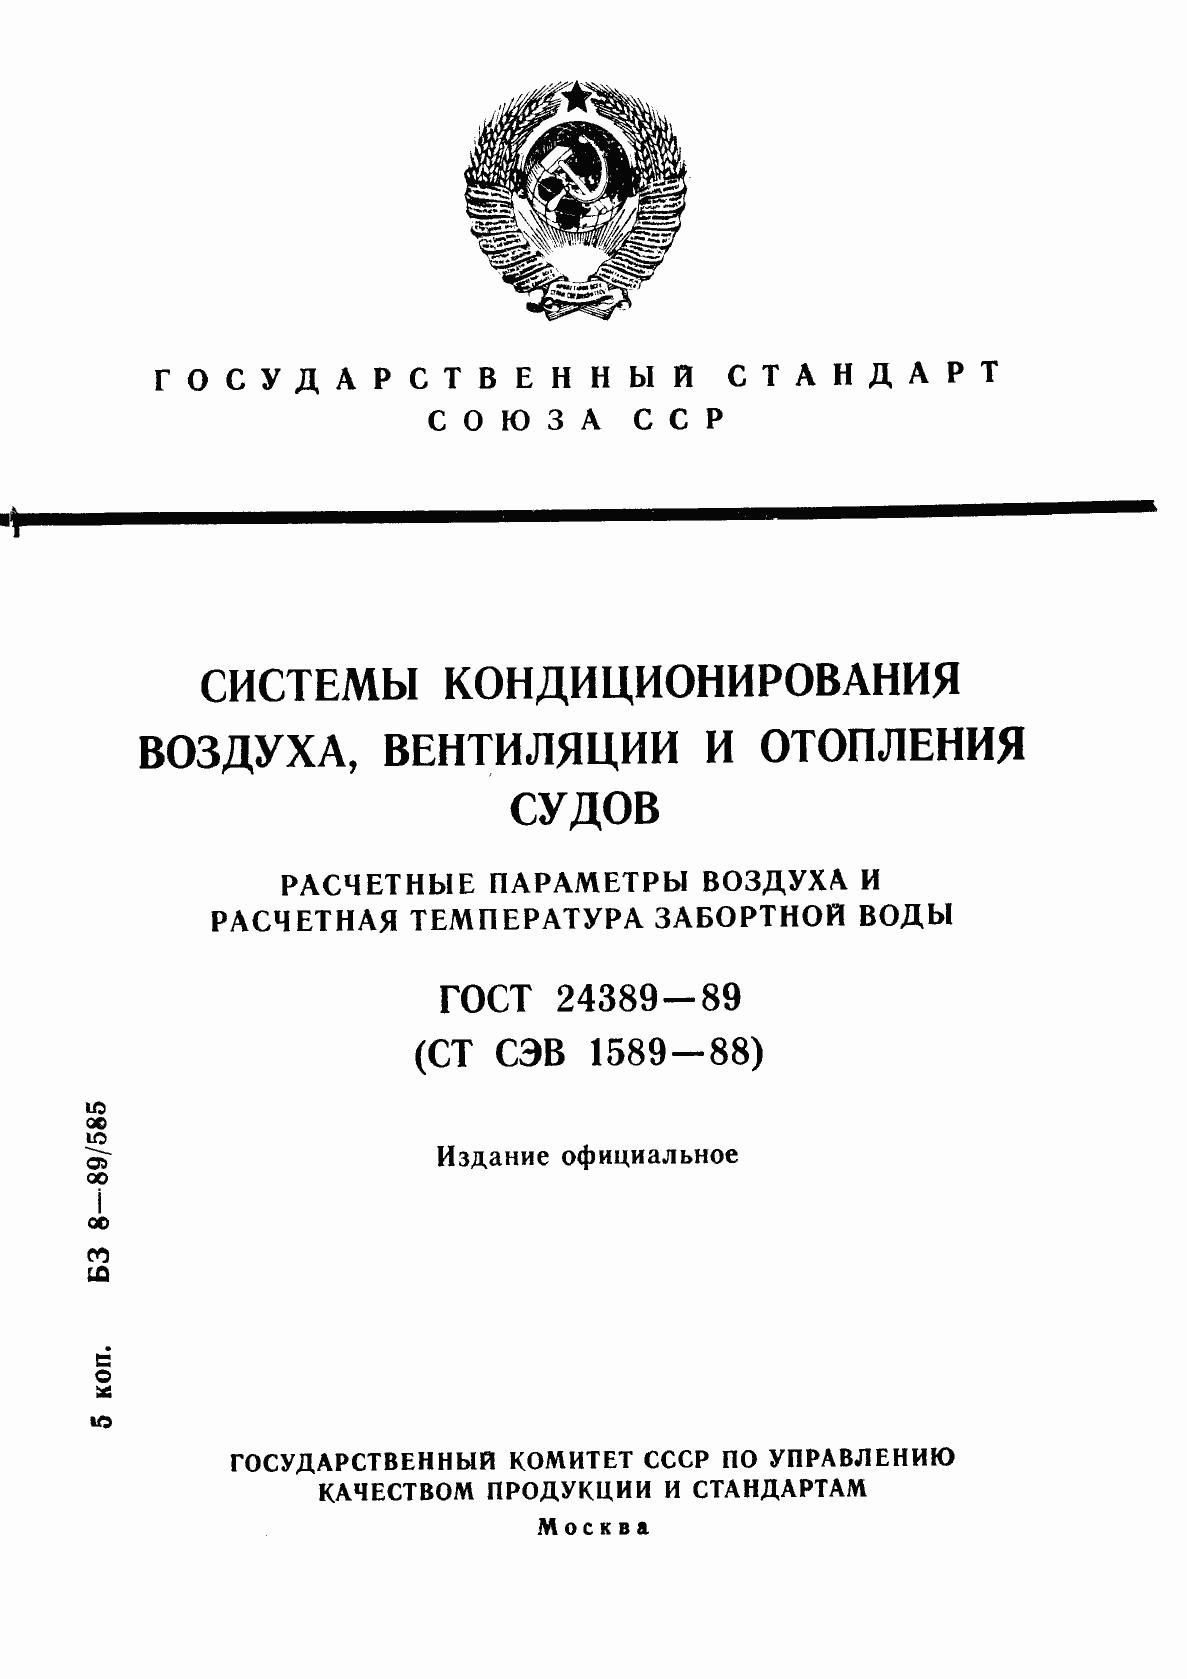 Гост 24389 89